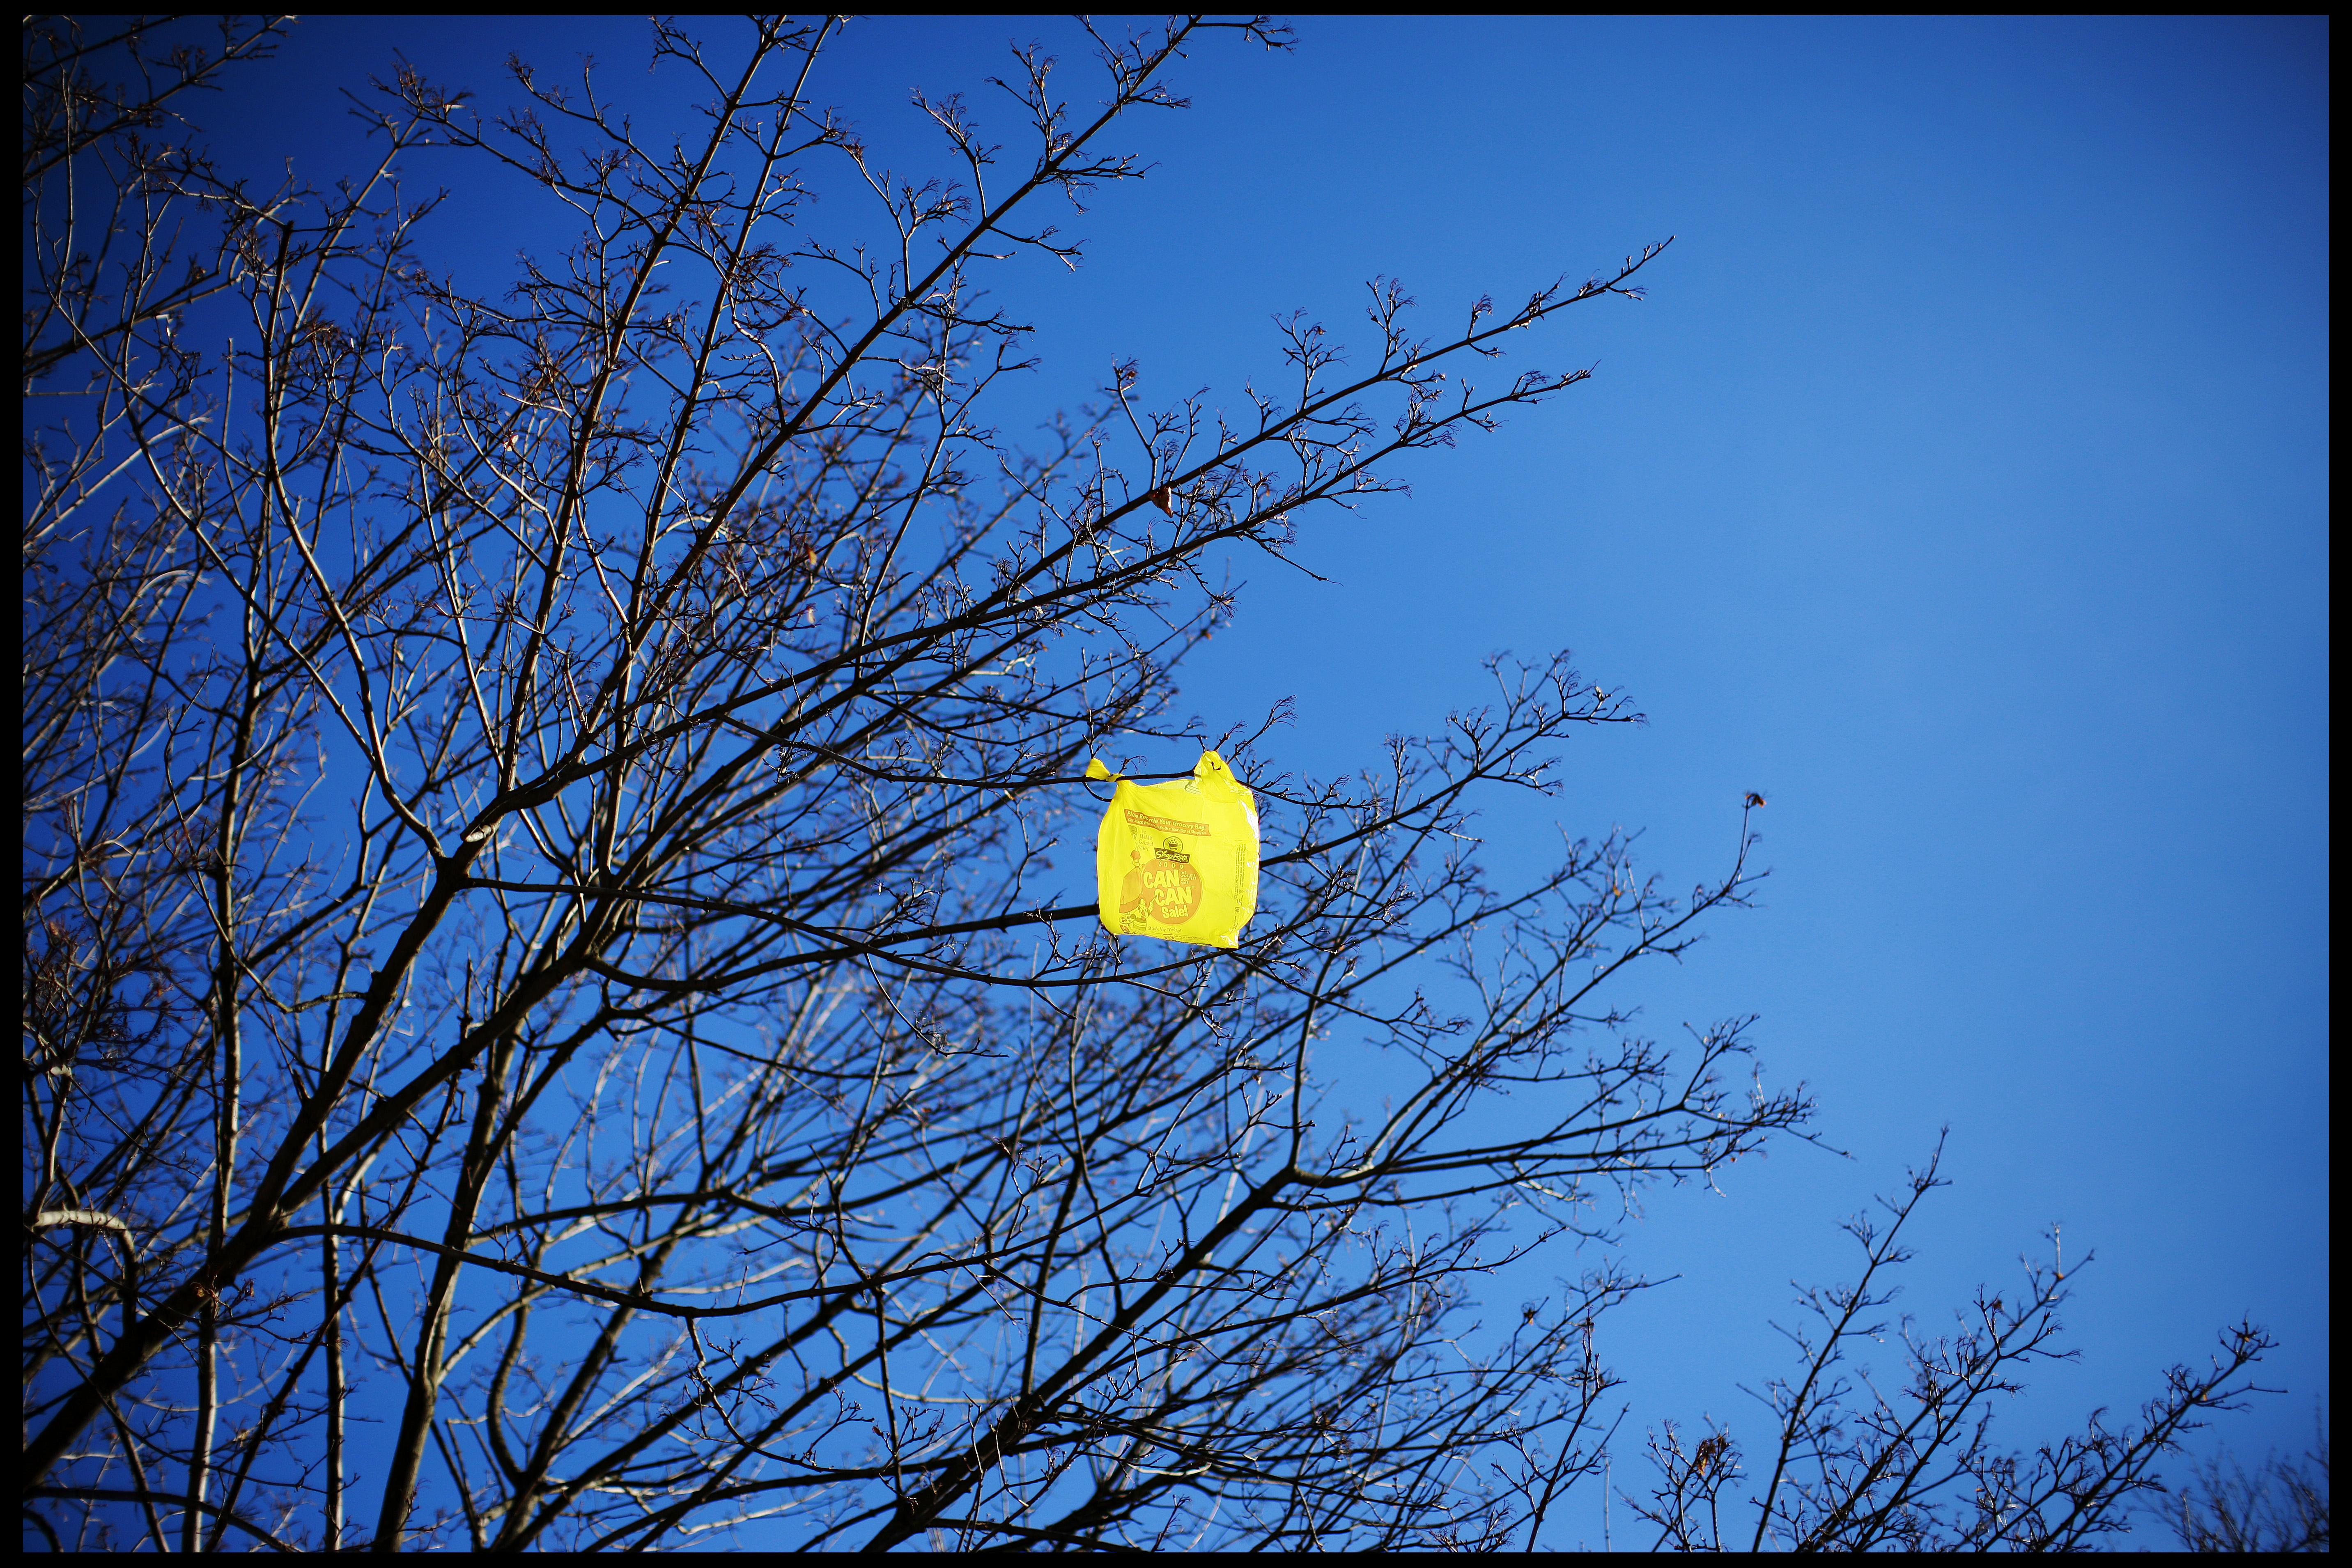 USA - Environment - Plastic Bag in Tree